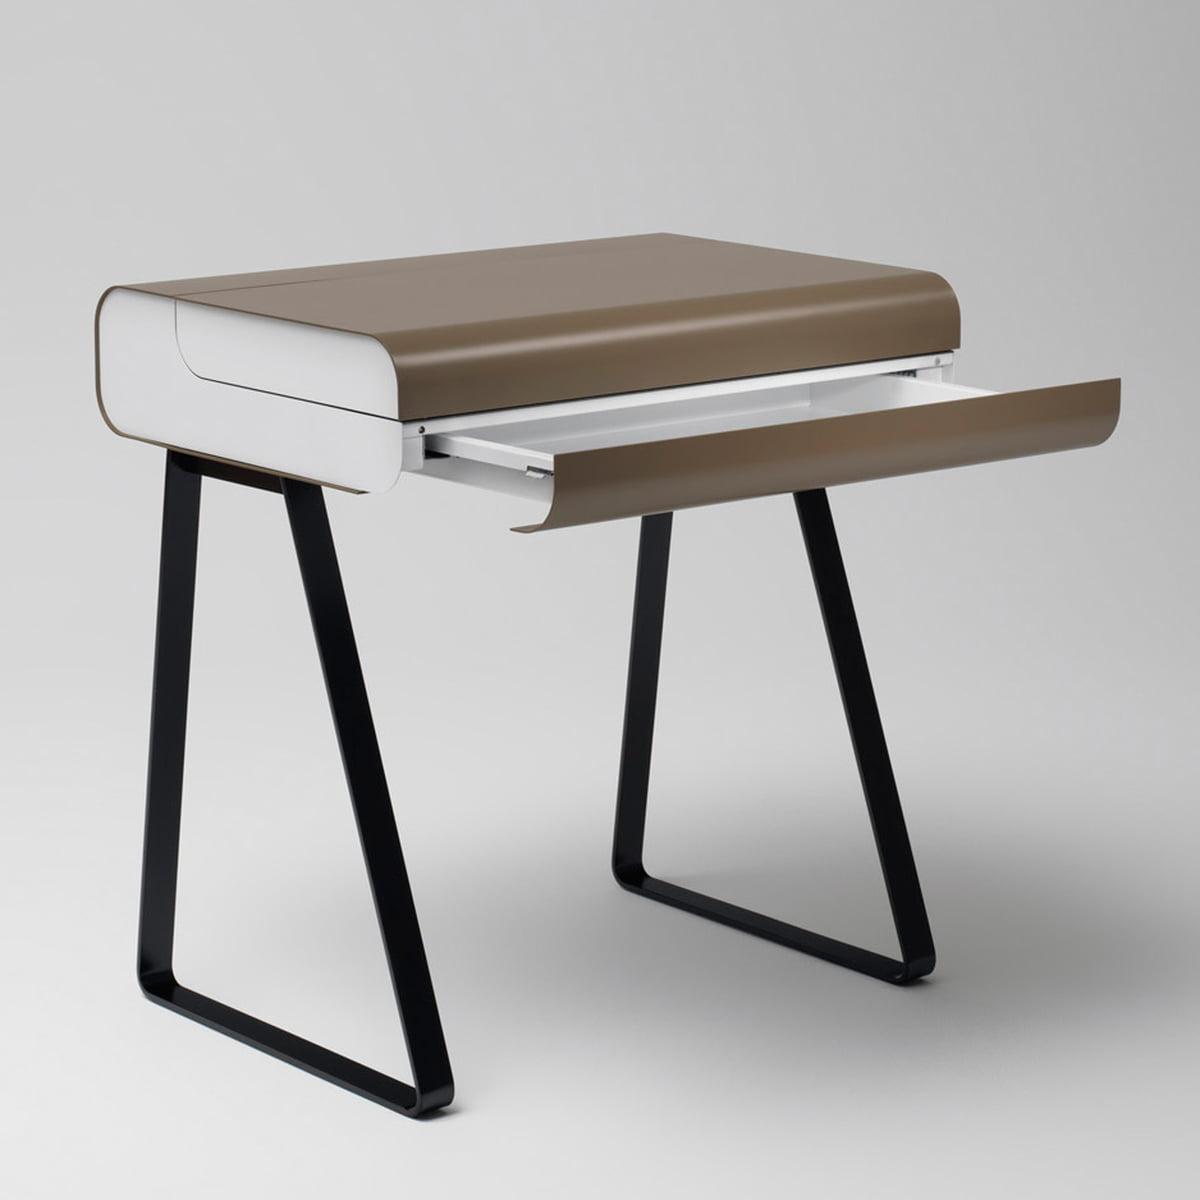 secr taire ps08 de m ller m belfabrikation. Black Bedroom Furniture Sets. Home Design Ideas